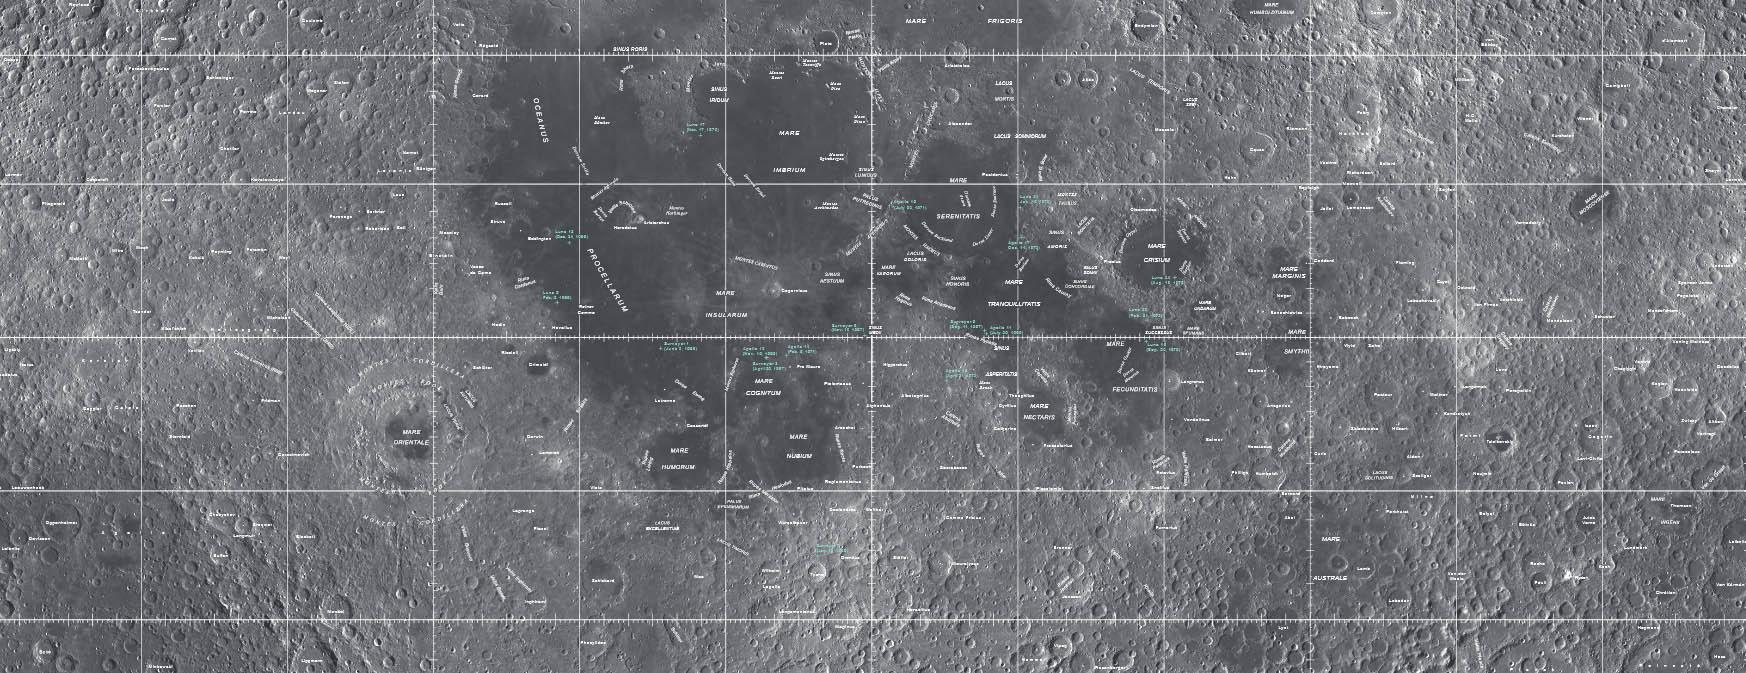 Beautiful, Informative Maps of the Moon - Sky & Telescope